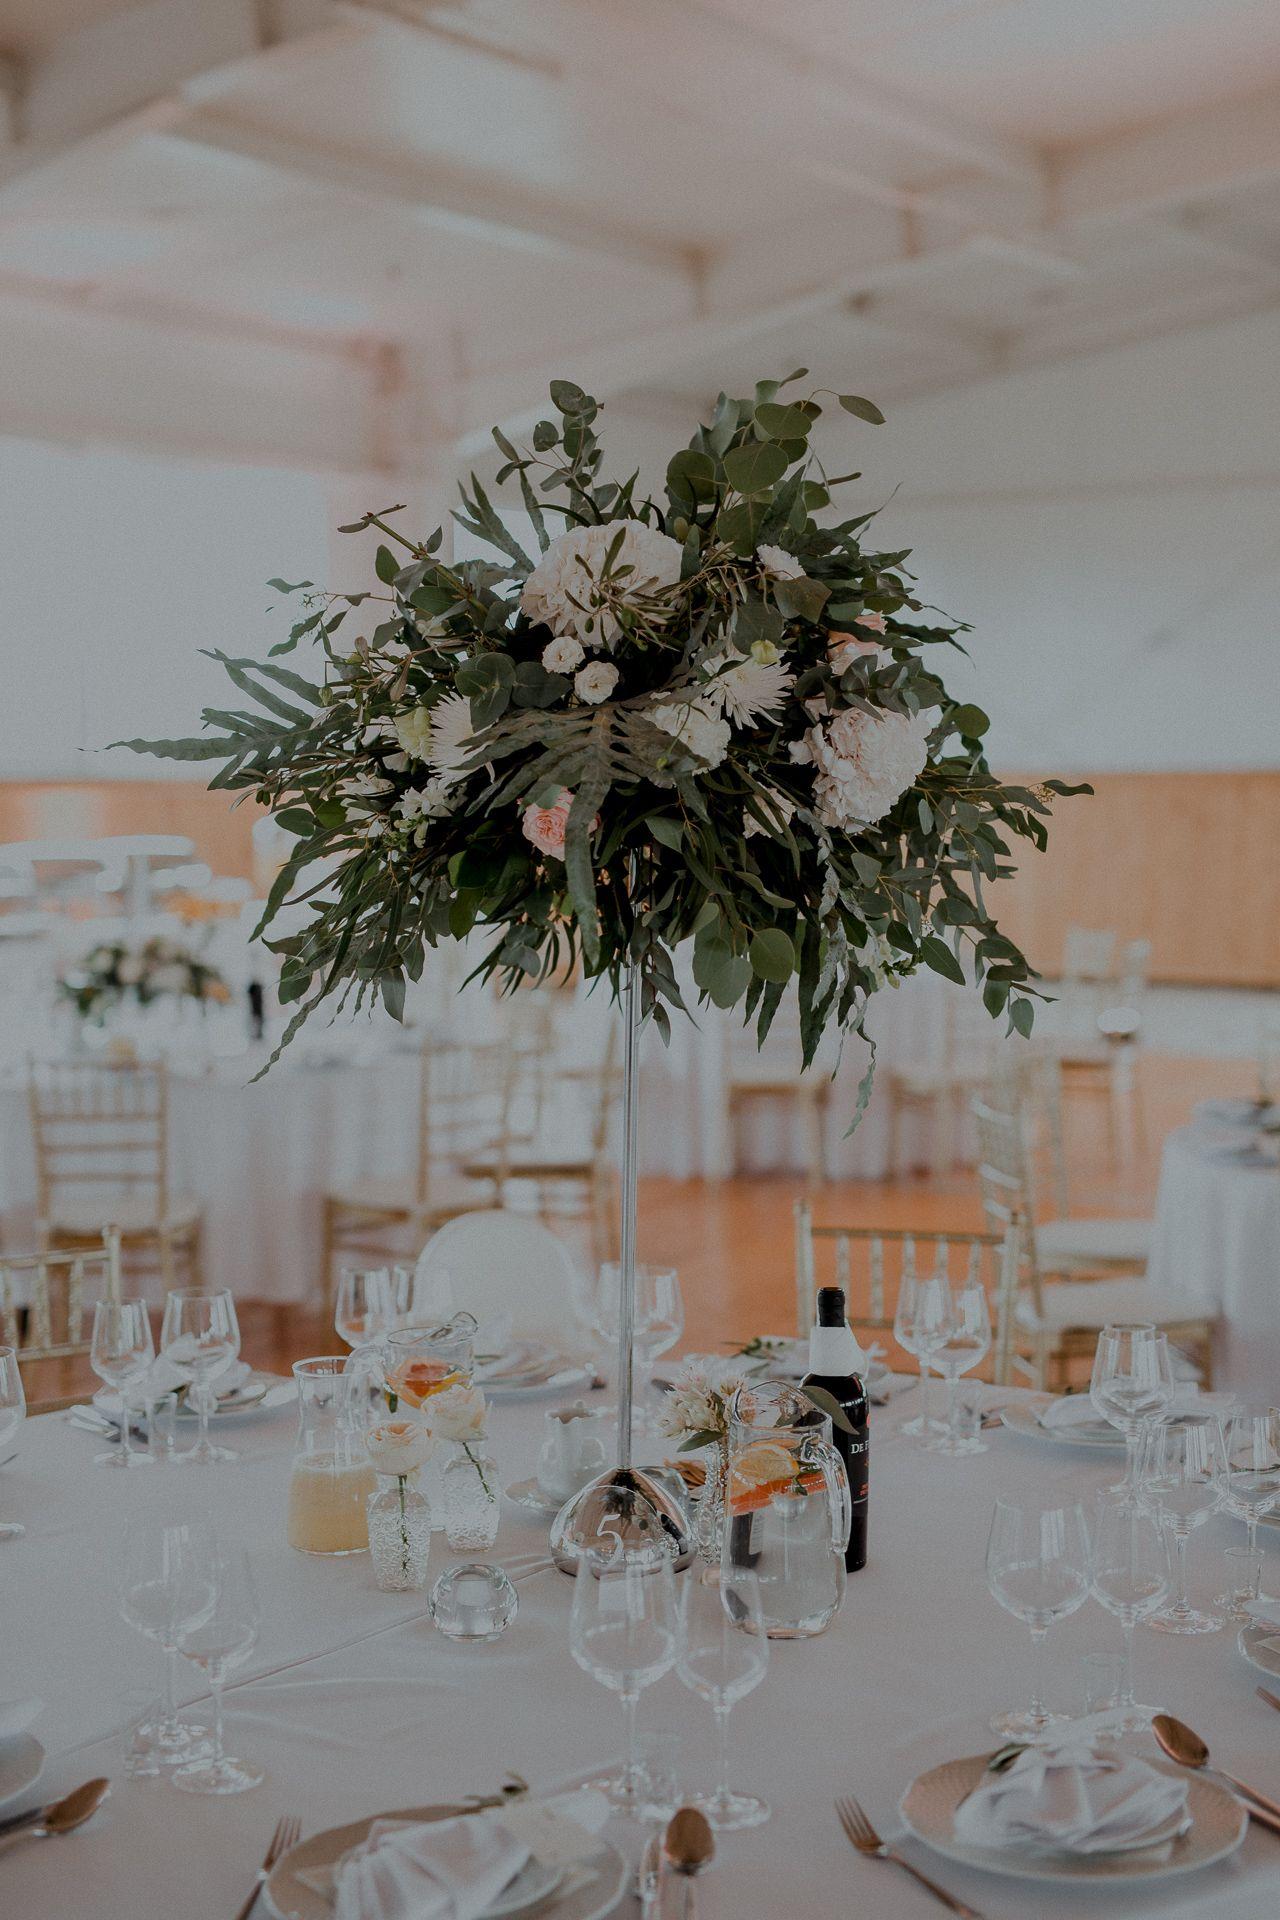 Inna Studio High Flowers On The Table Flowers For The Wedding Summer Wedding Green Wedding White Flowers Hi Wedding Decorations Wedding Table Decorations